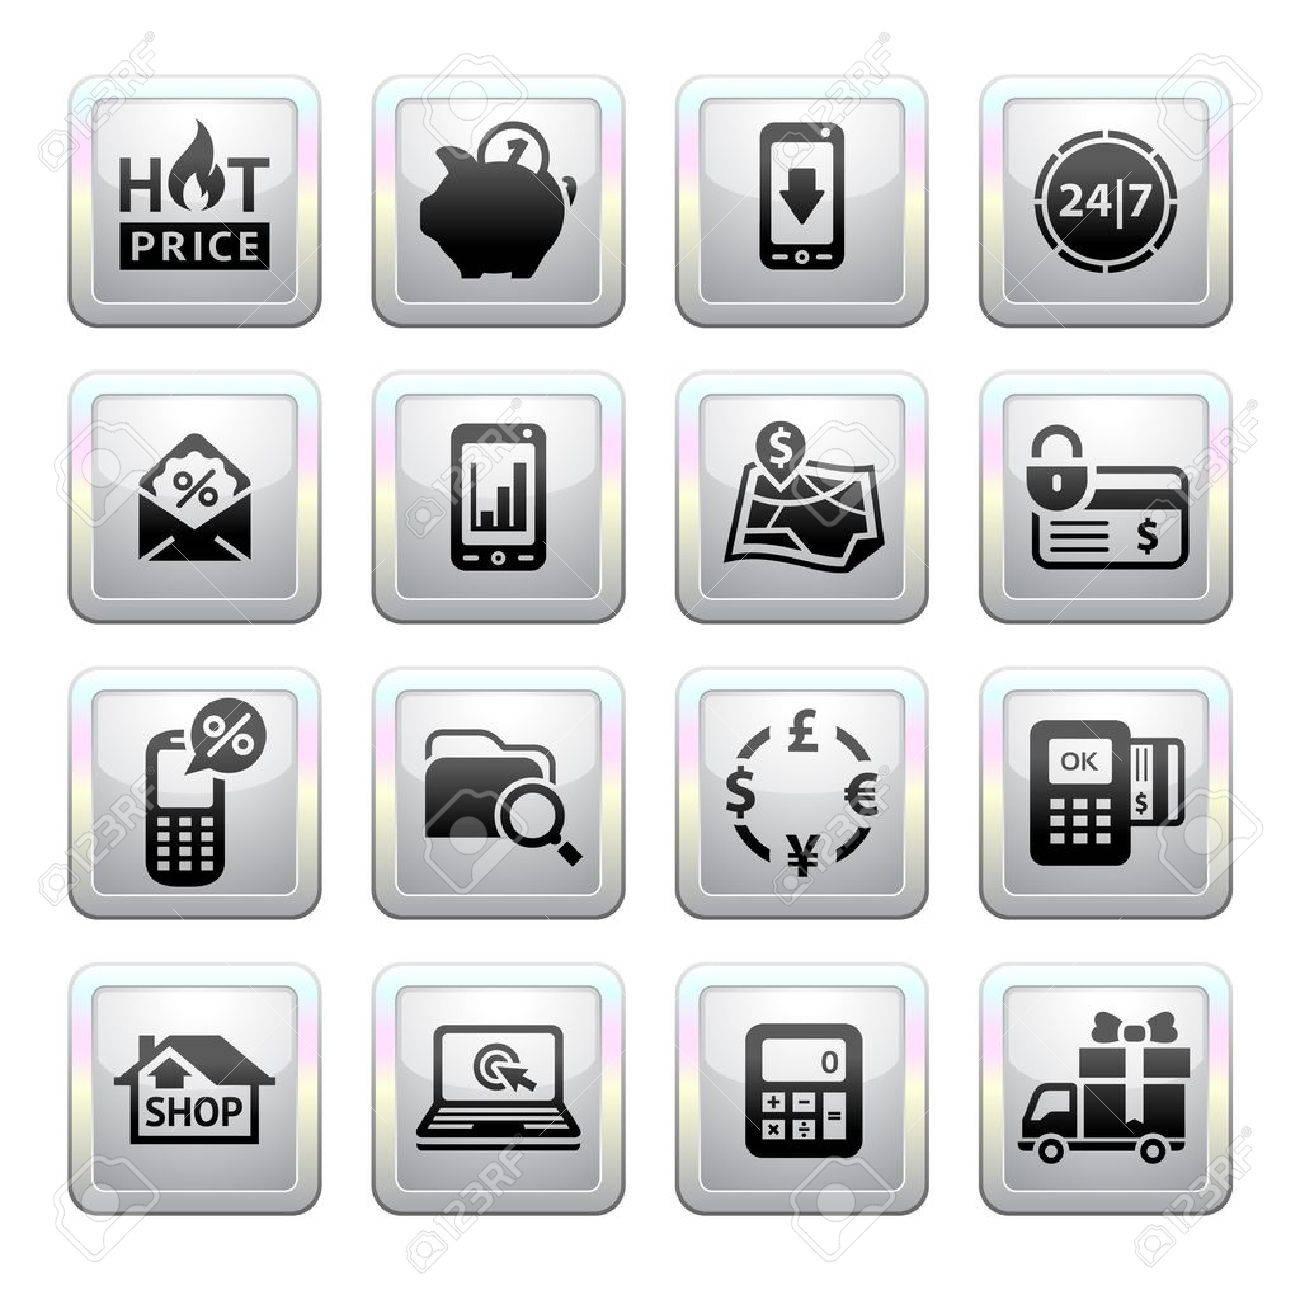 Shopping icons gray web 2 0 icons royalty free cliparts vectors shopping icons gray web 2 0 icons stock vector 19155905 sciox Choice Image